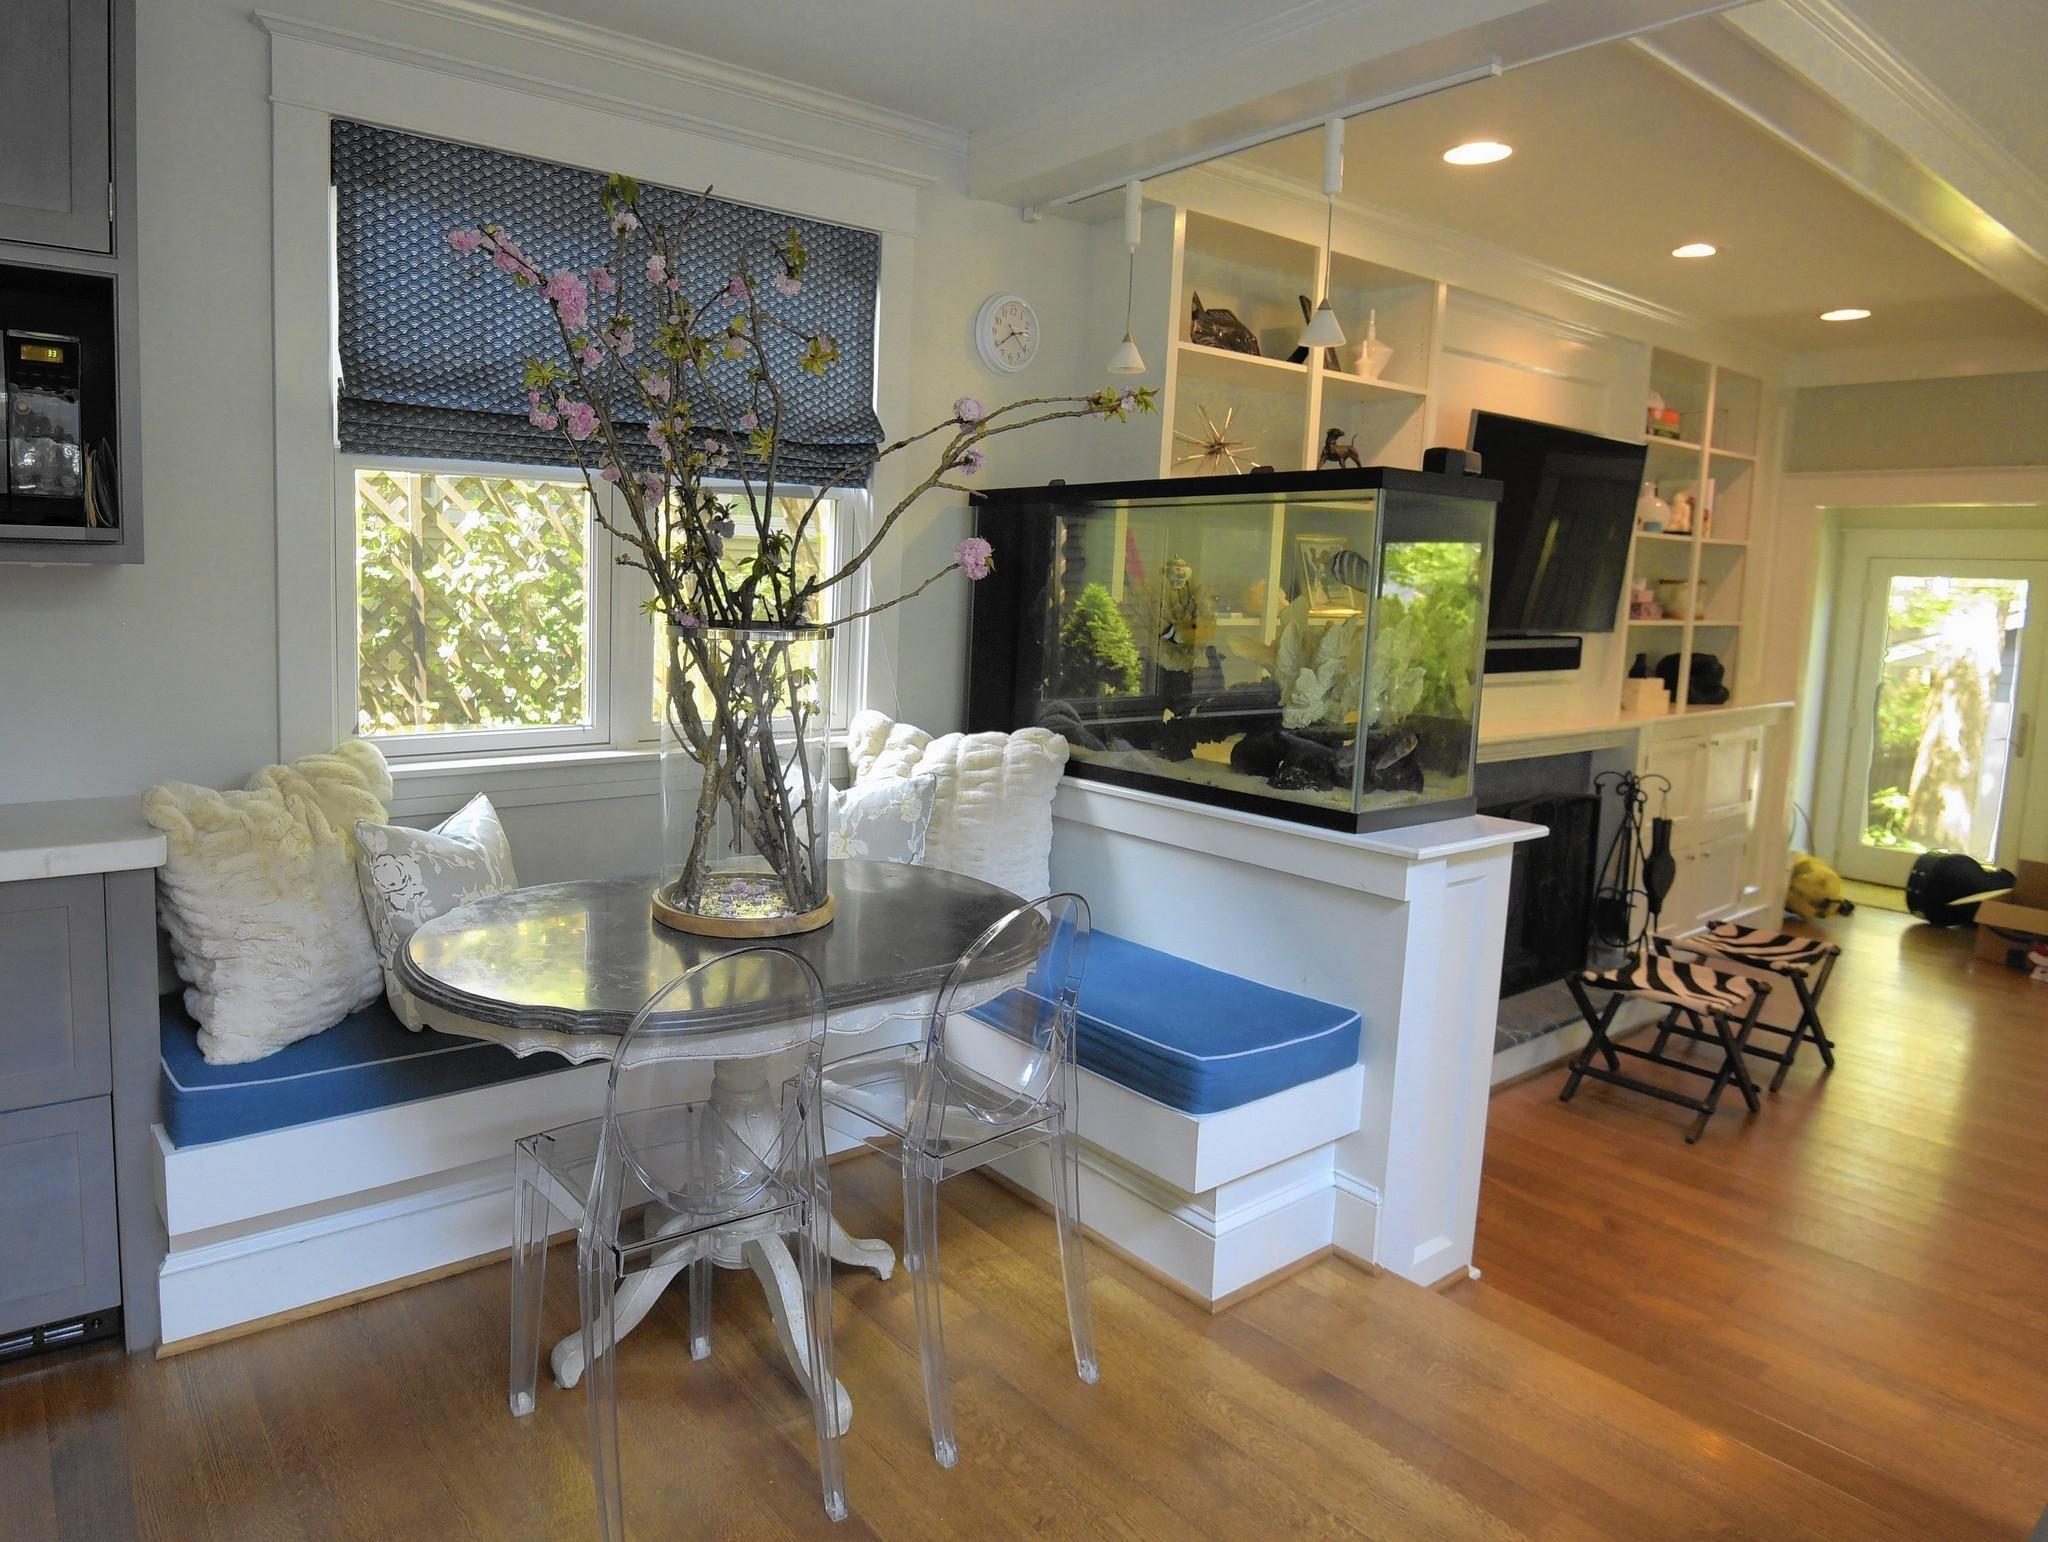 Subtle beach home decor goes beyond seashells and